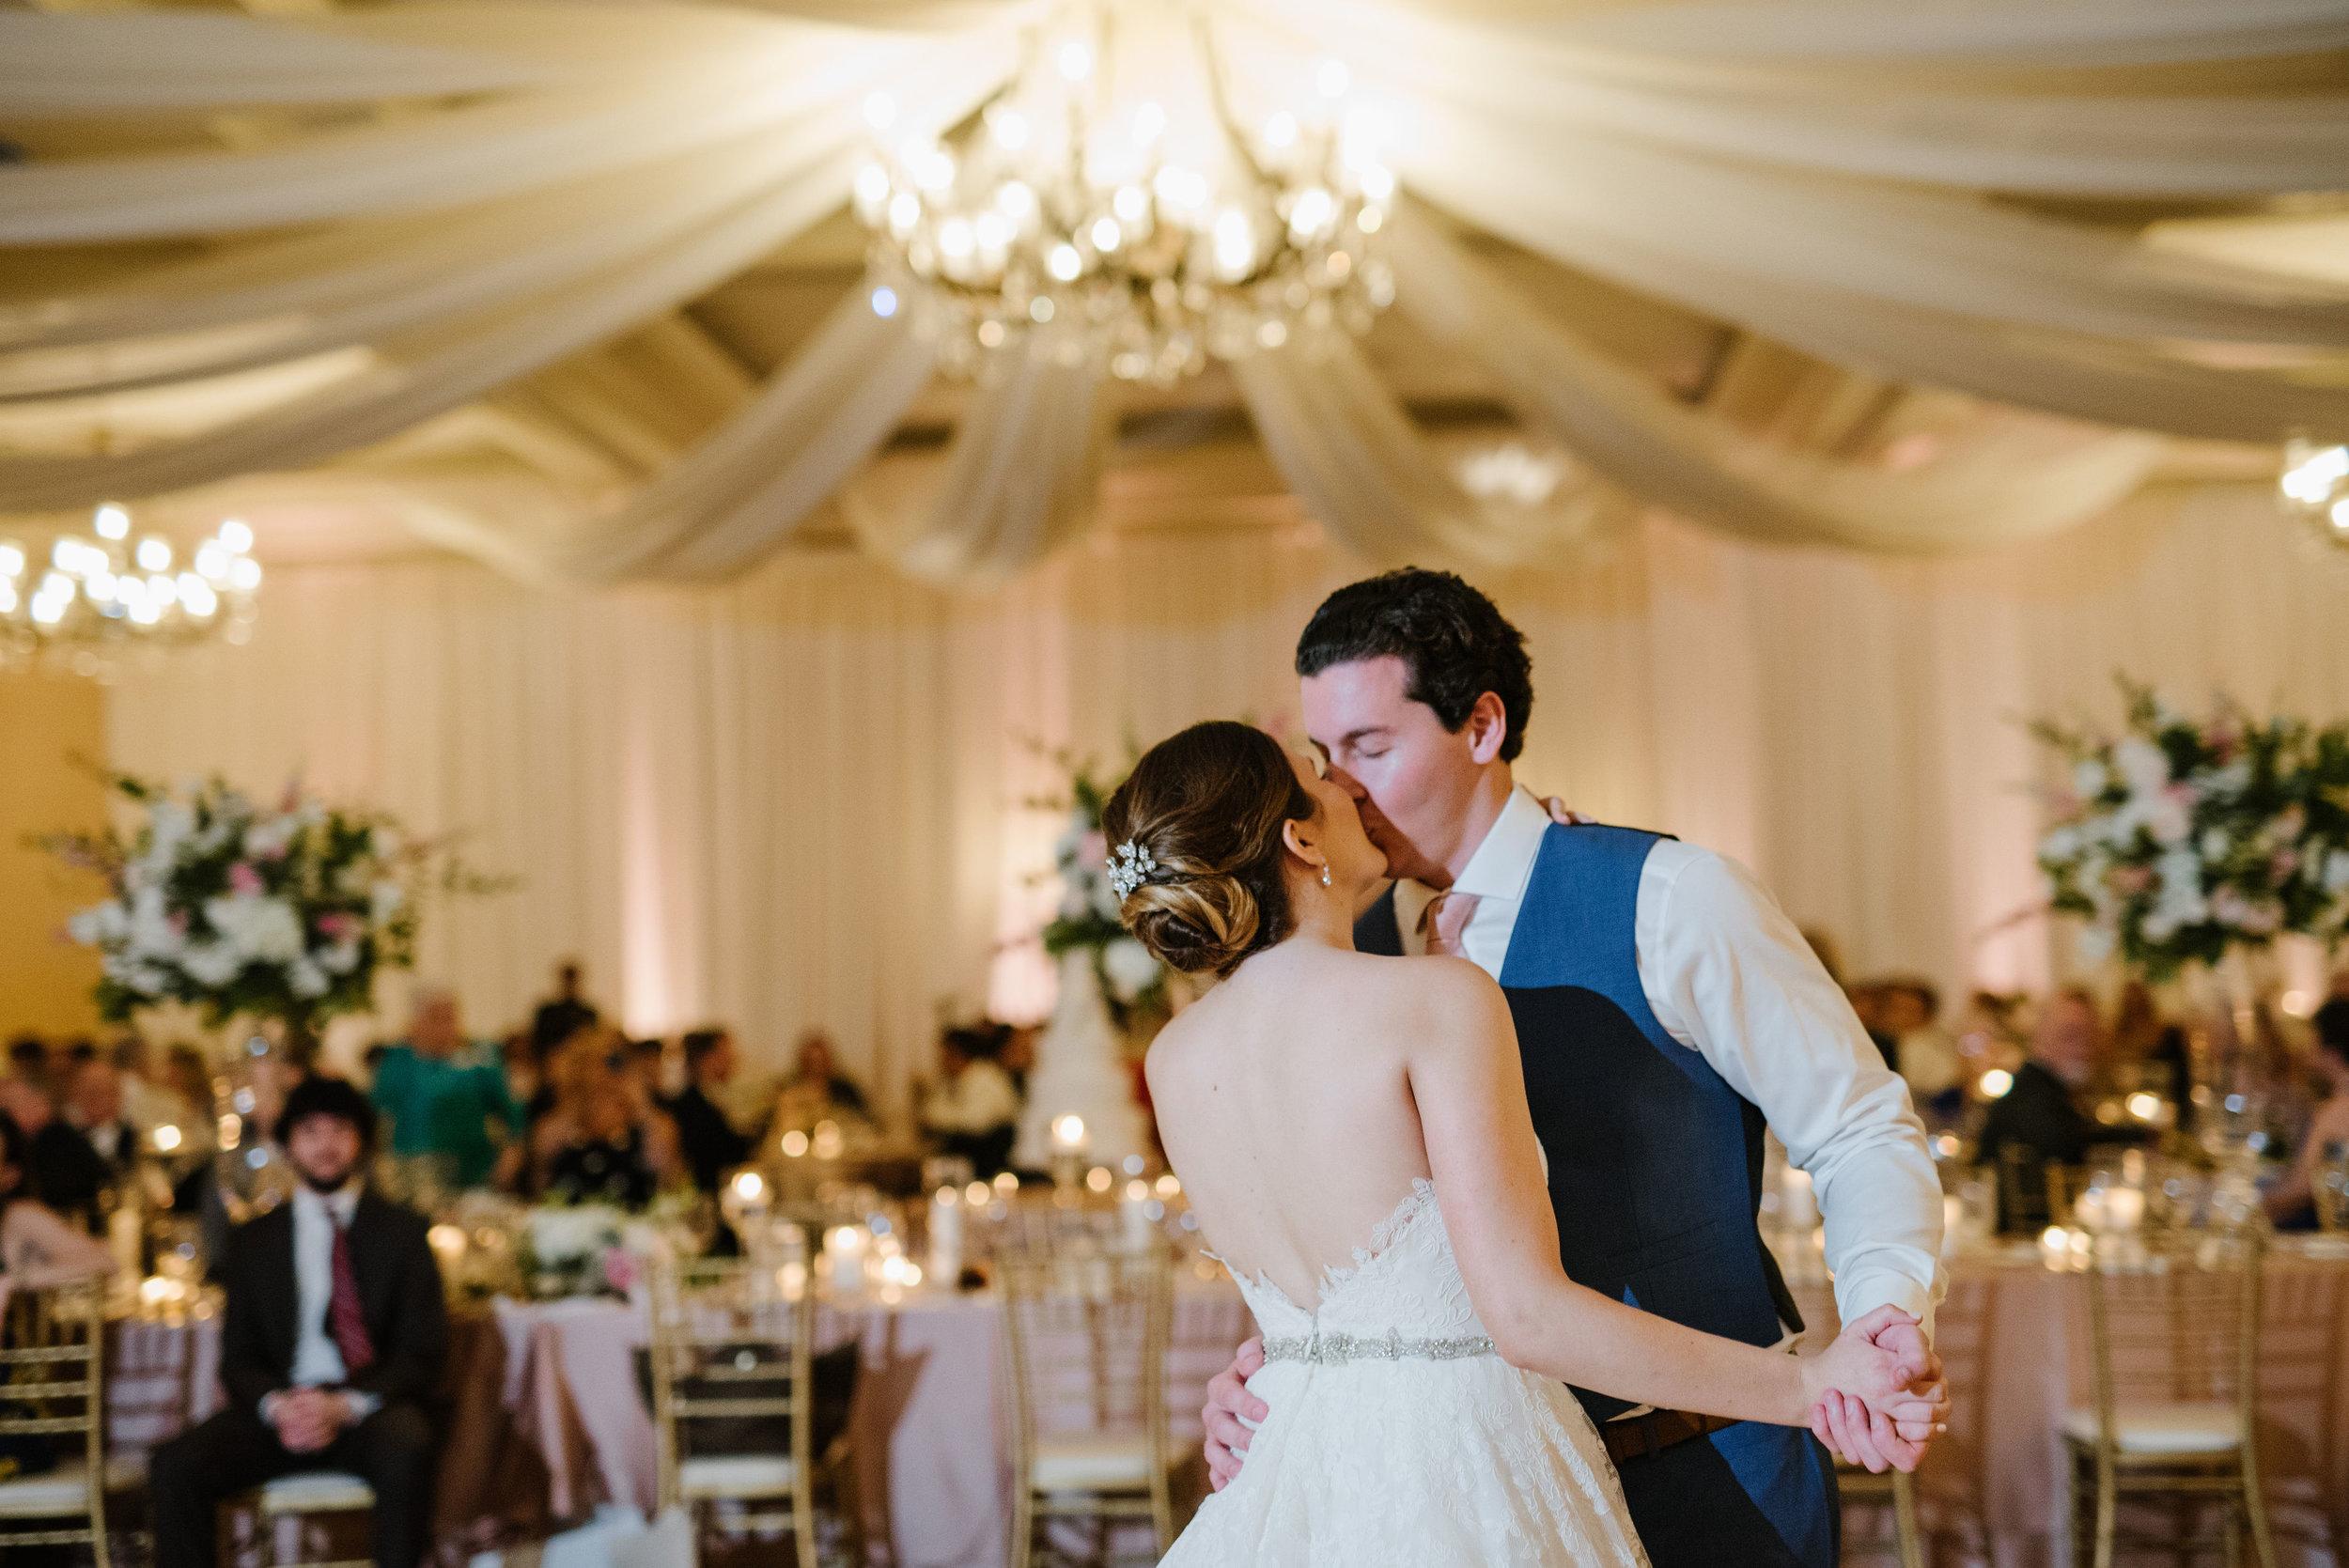 McElravey_Wedding_CarolineLimaPhotography_2018_329.jpg